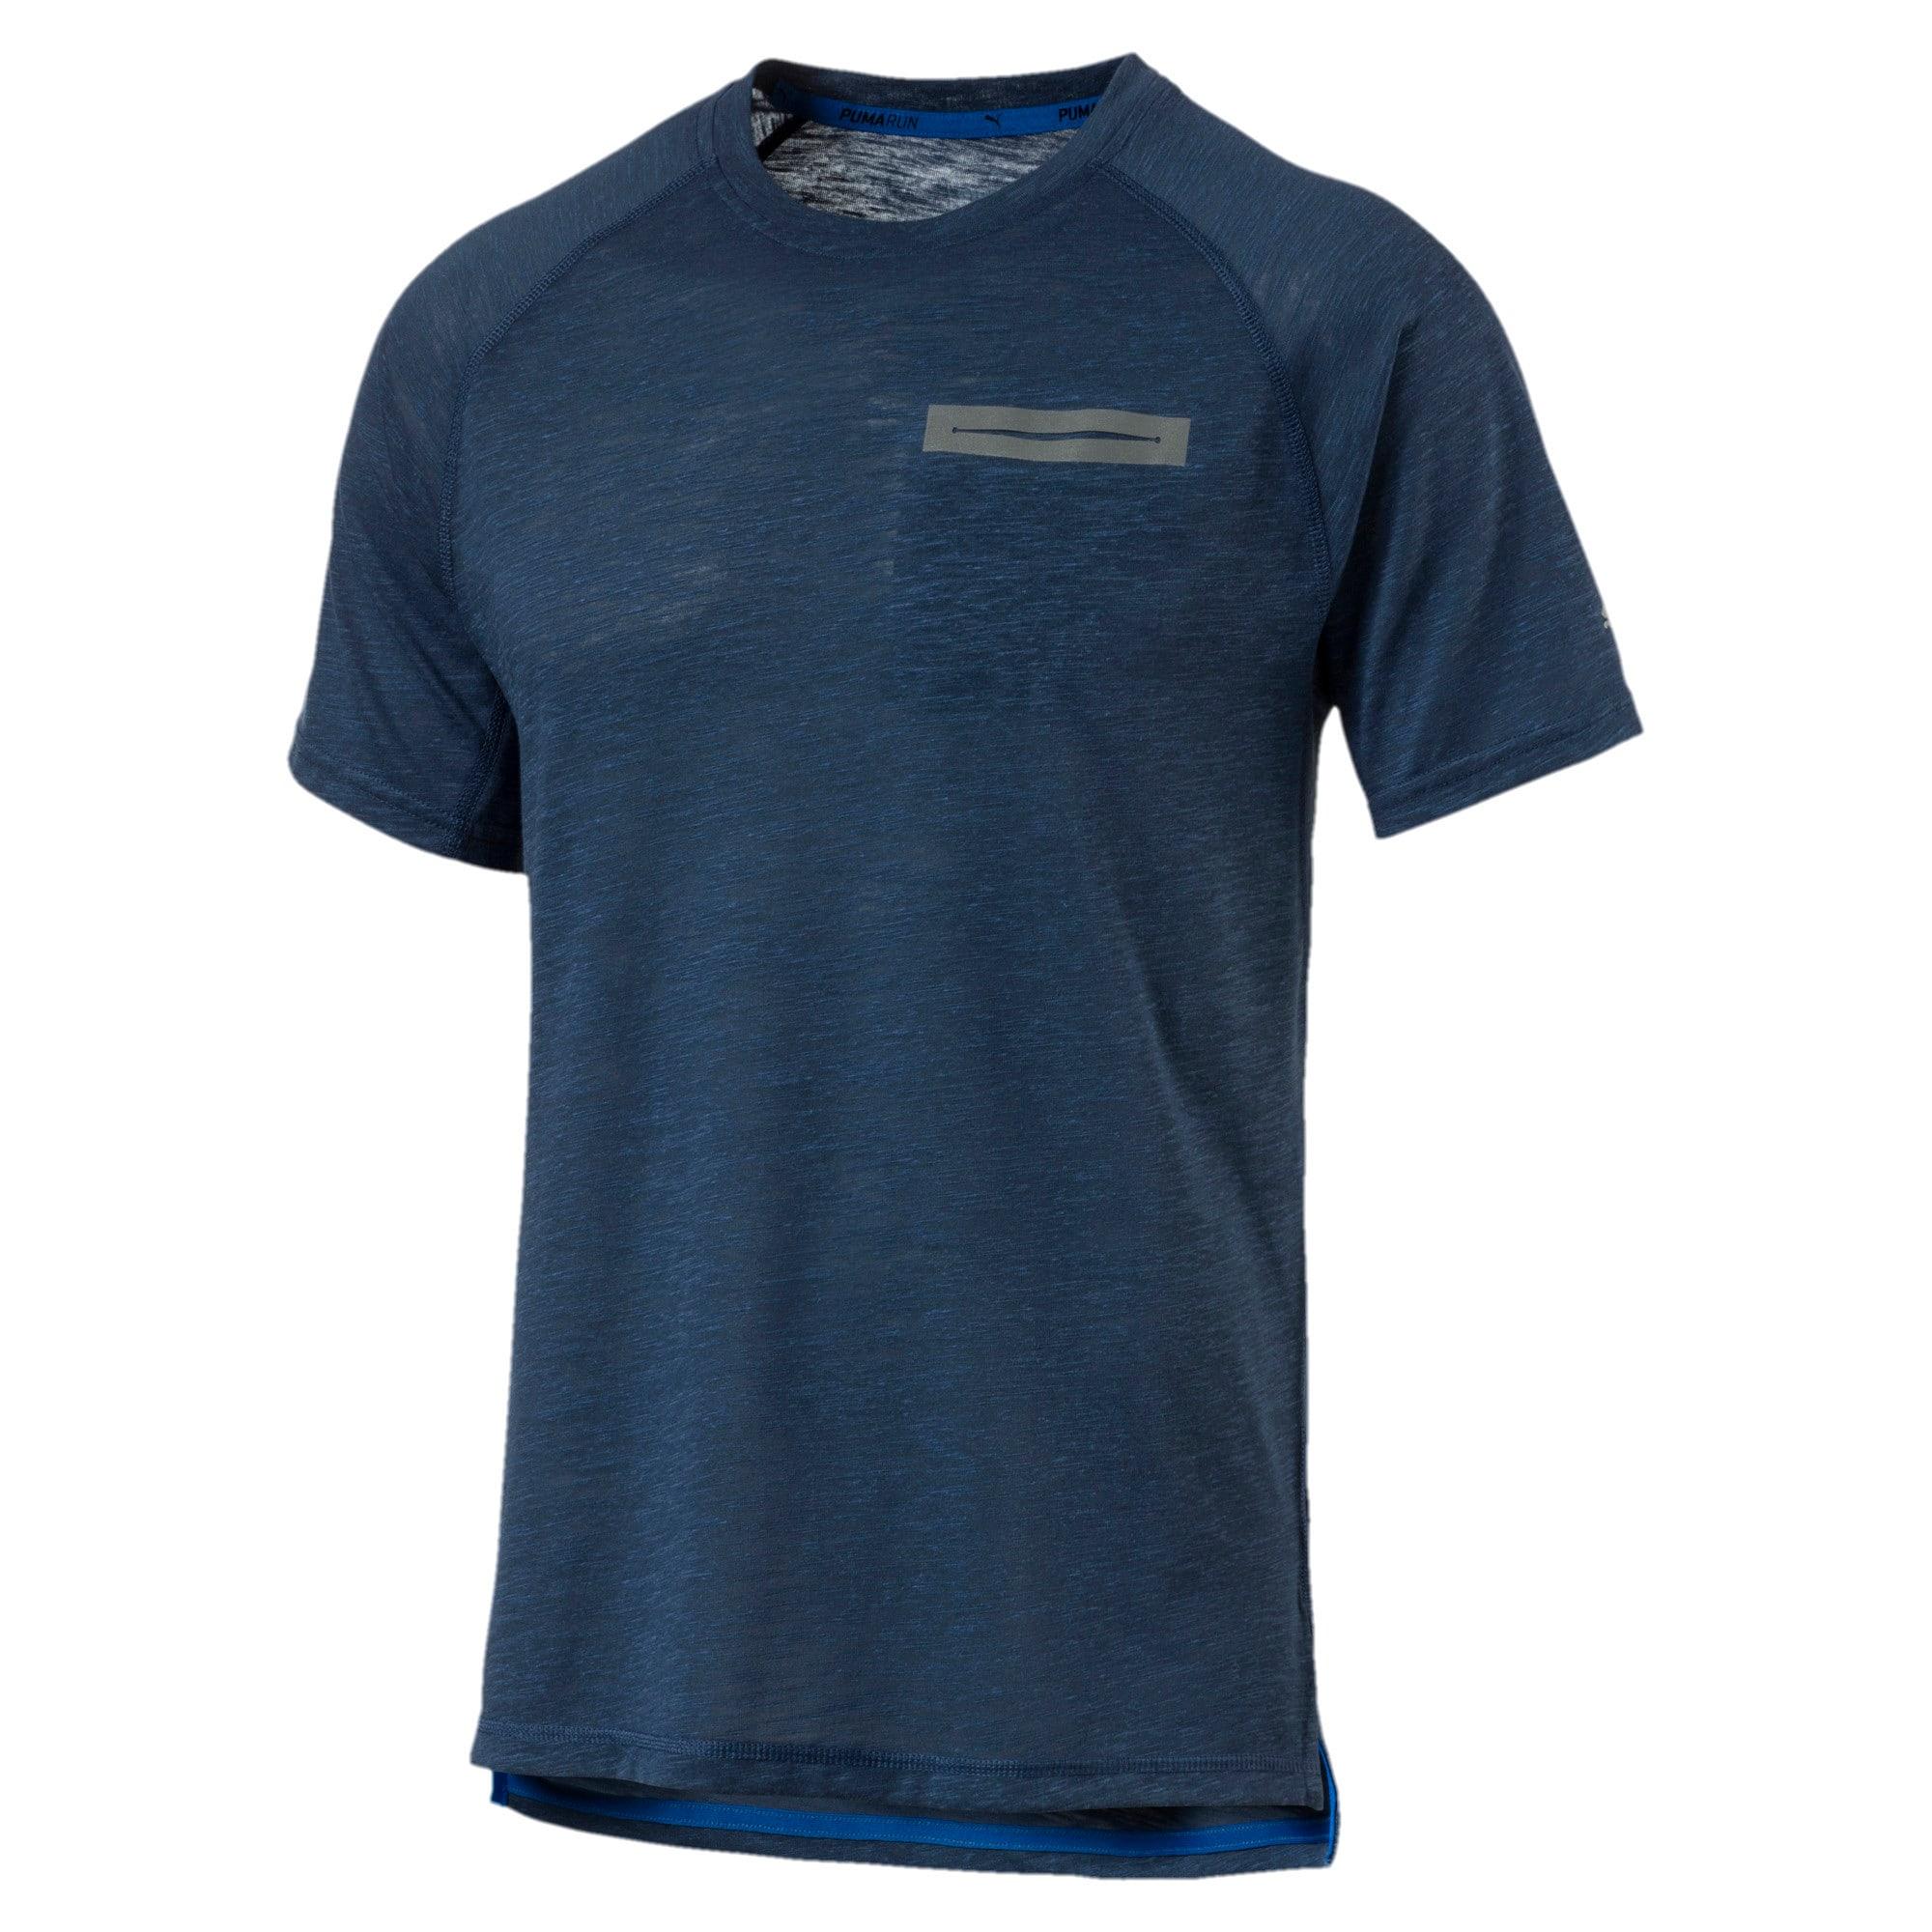 Thumbnail 3 of Energy Short Sleeve Men's Running T-Shirt, Sargasso Sea Heather, medium-IND